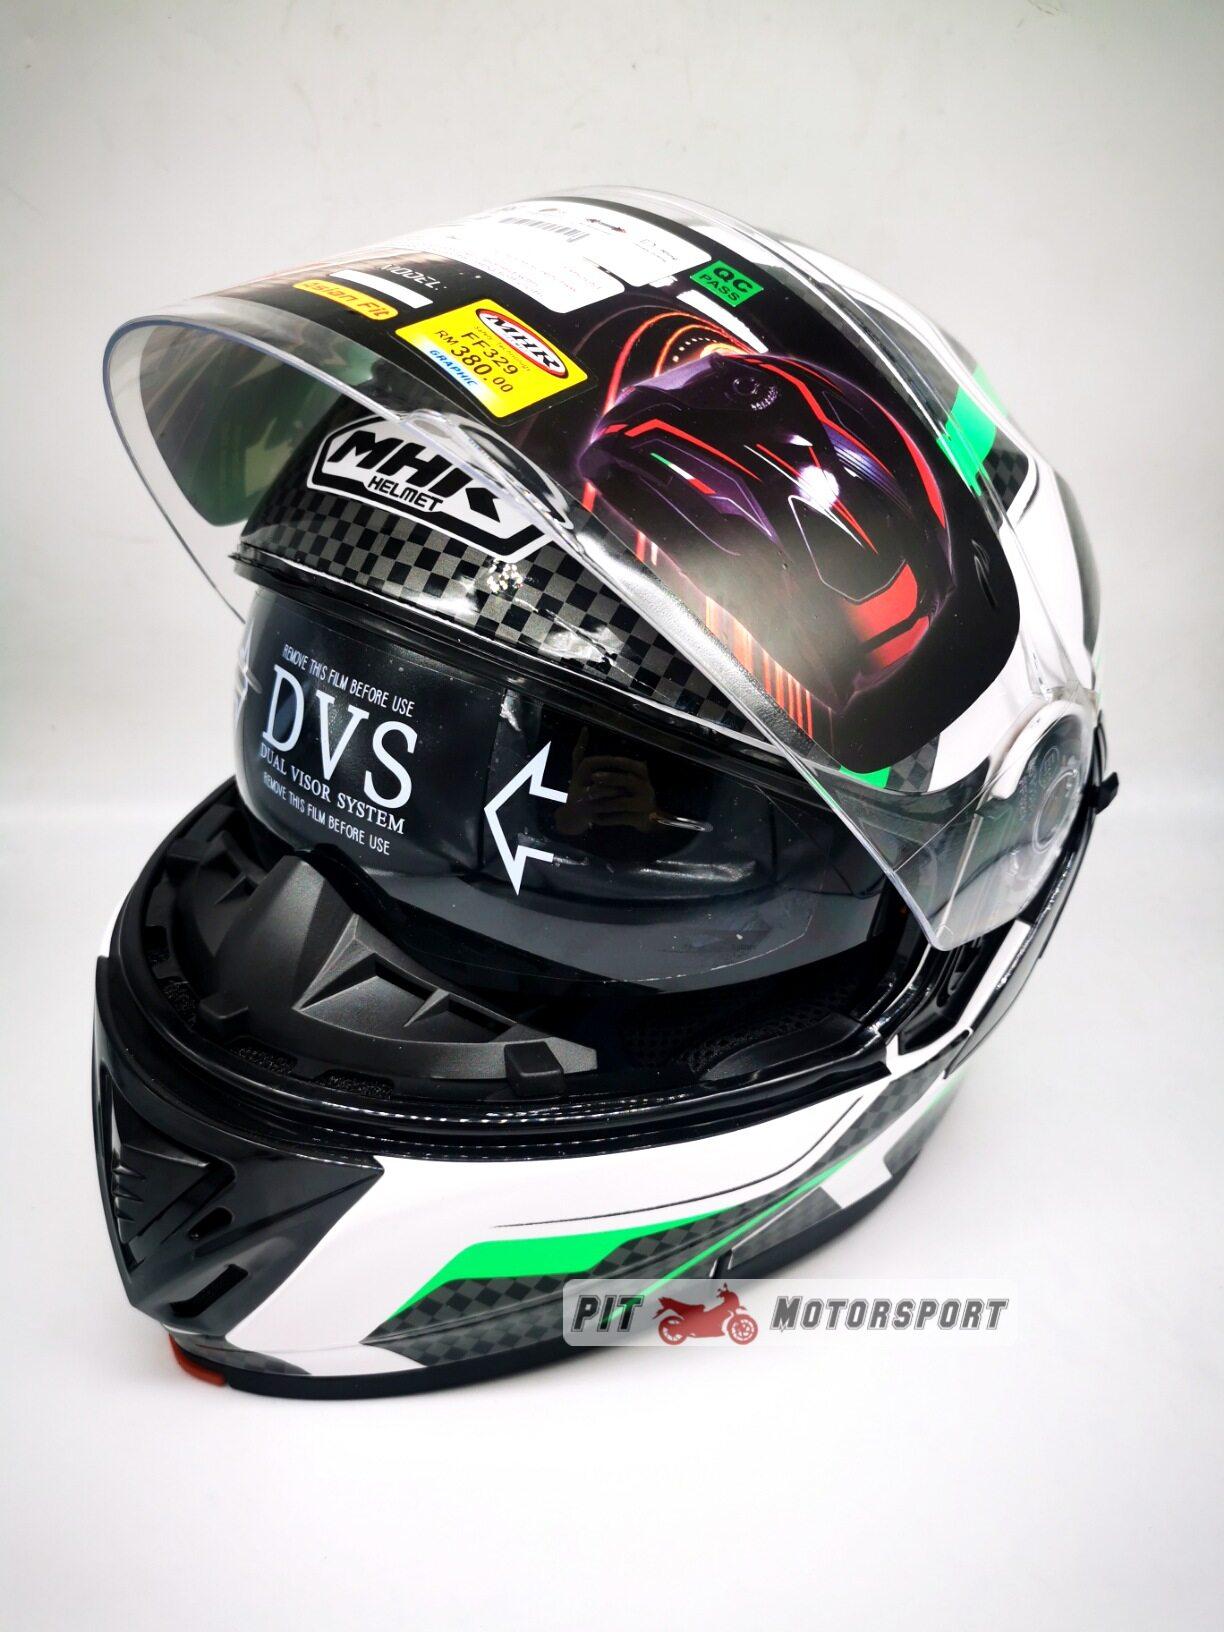 MHR Full Face Flip Up Double Visor Helmet New Design FF329 GT4 GP RACING Green Protect Protection Helmet Hijau